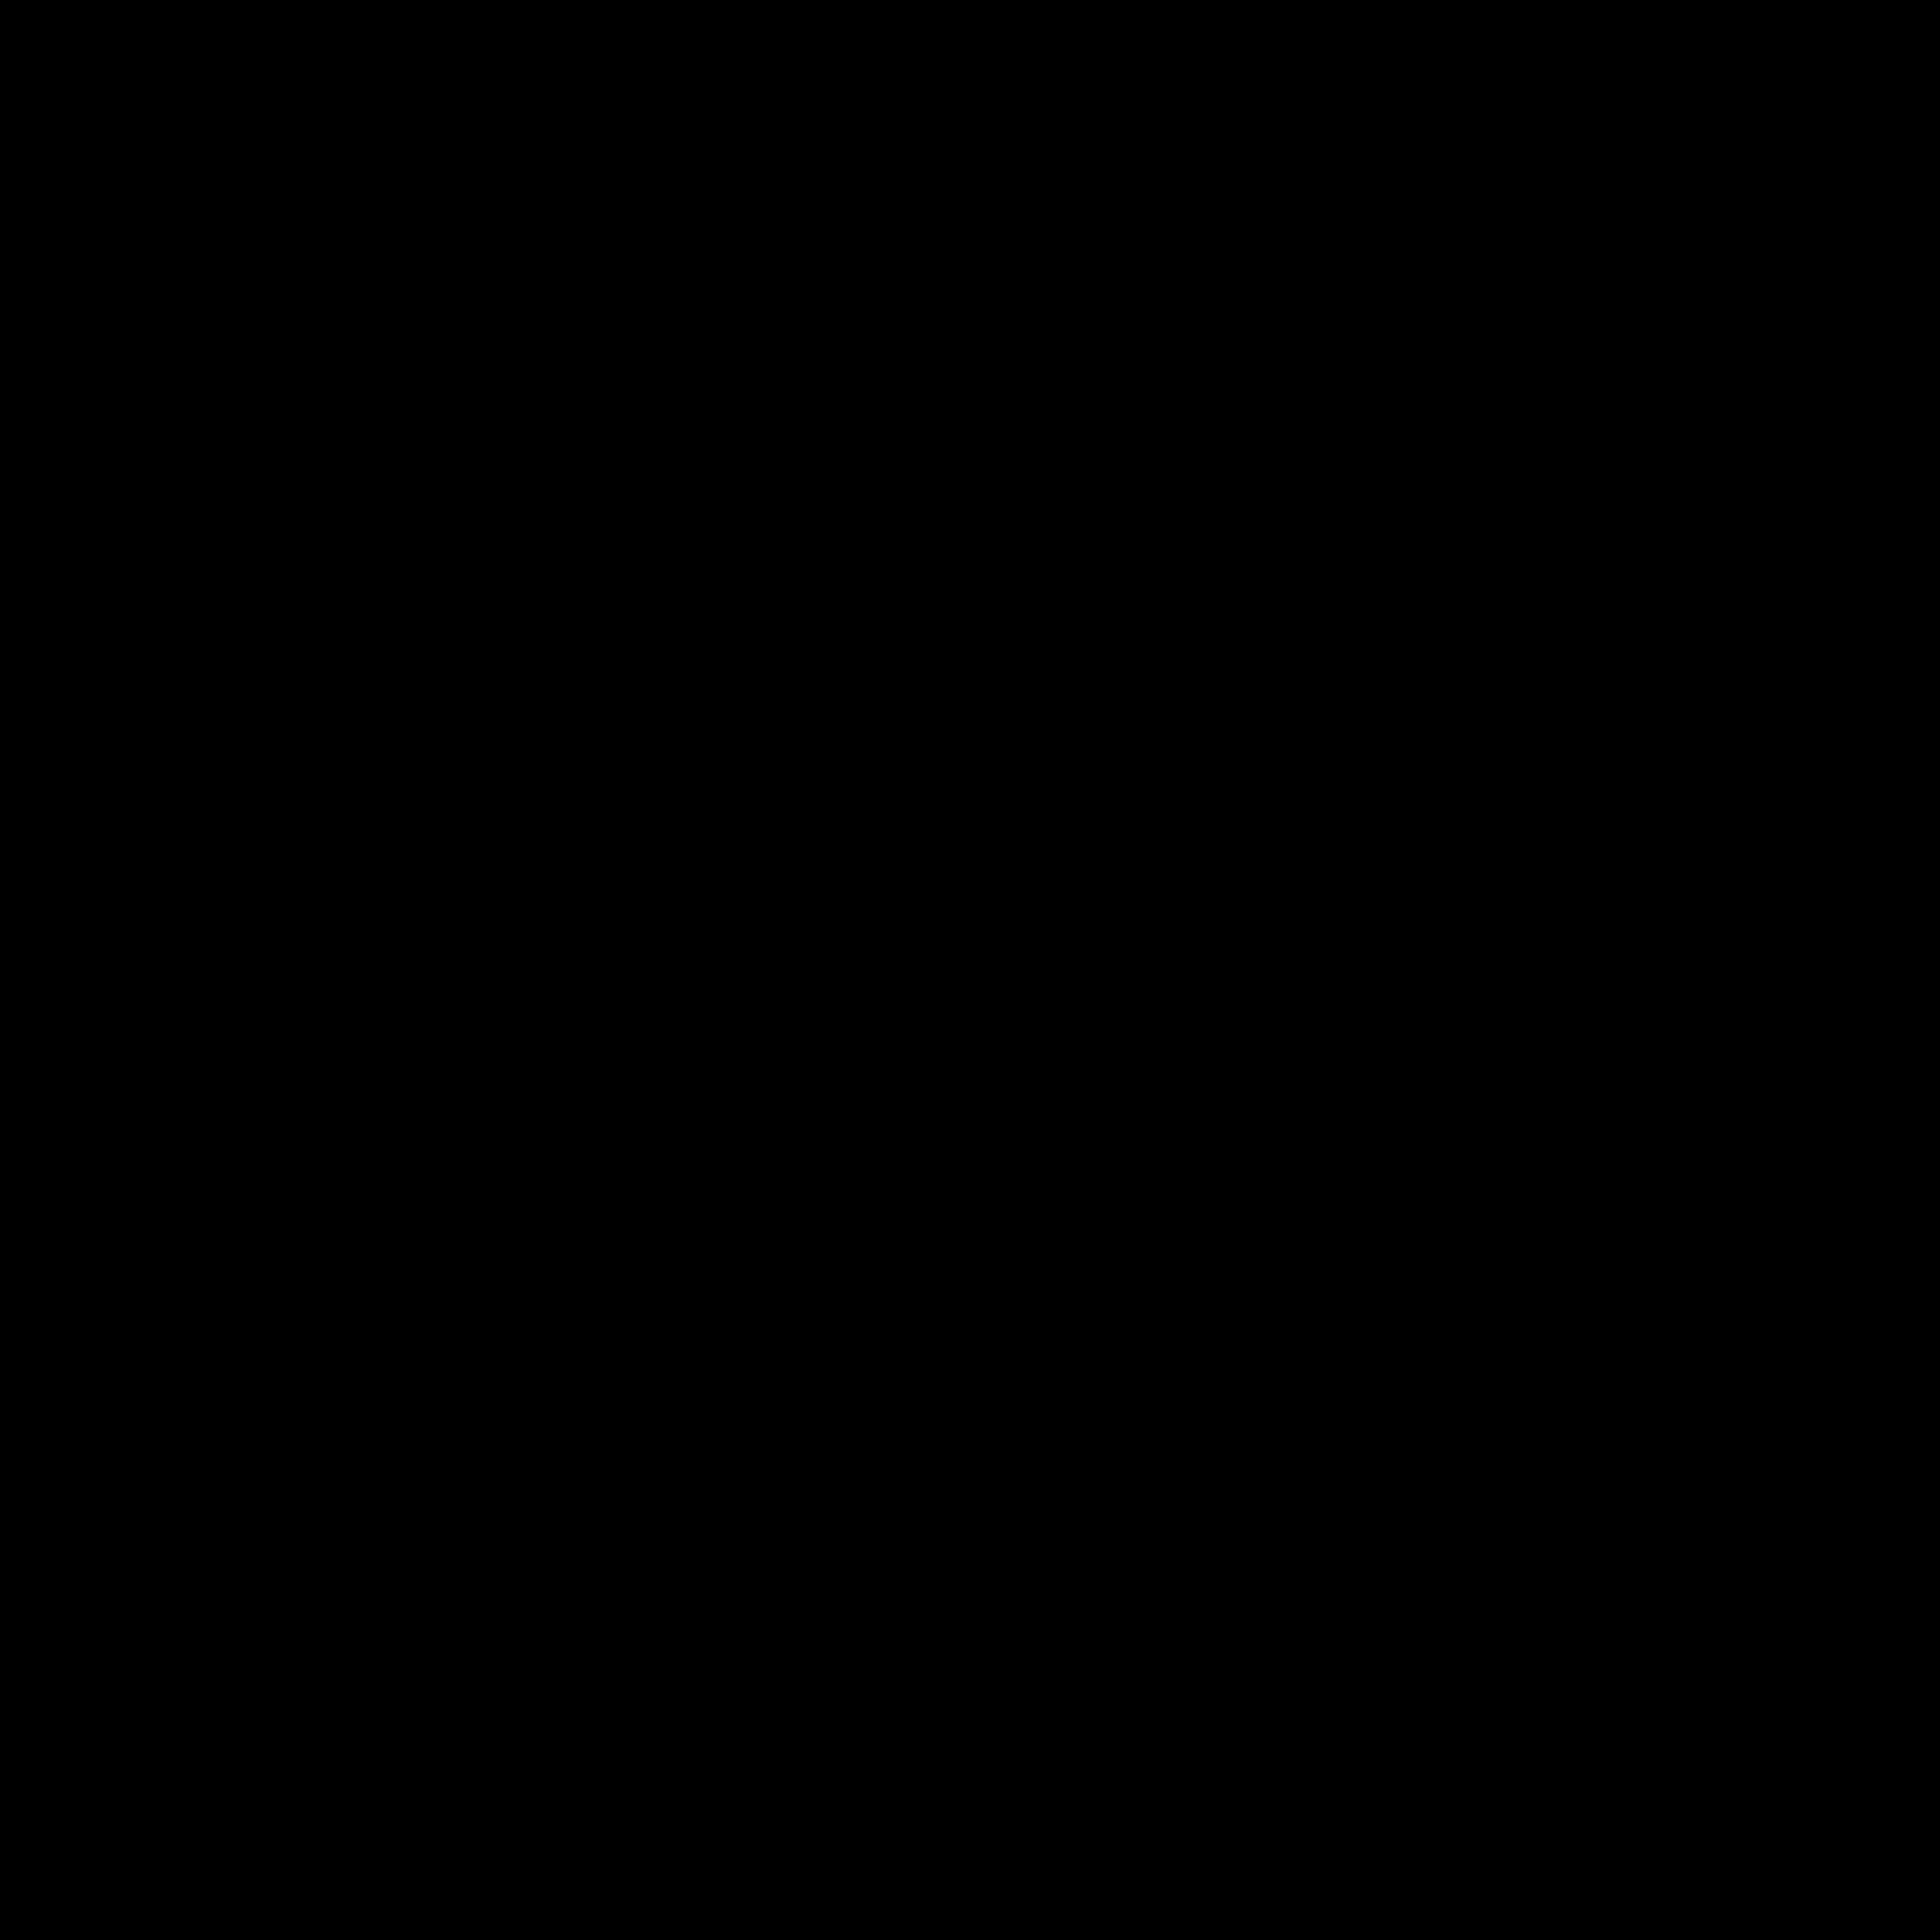 2400x2400 Frame Clipart Scallop